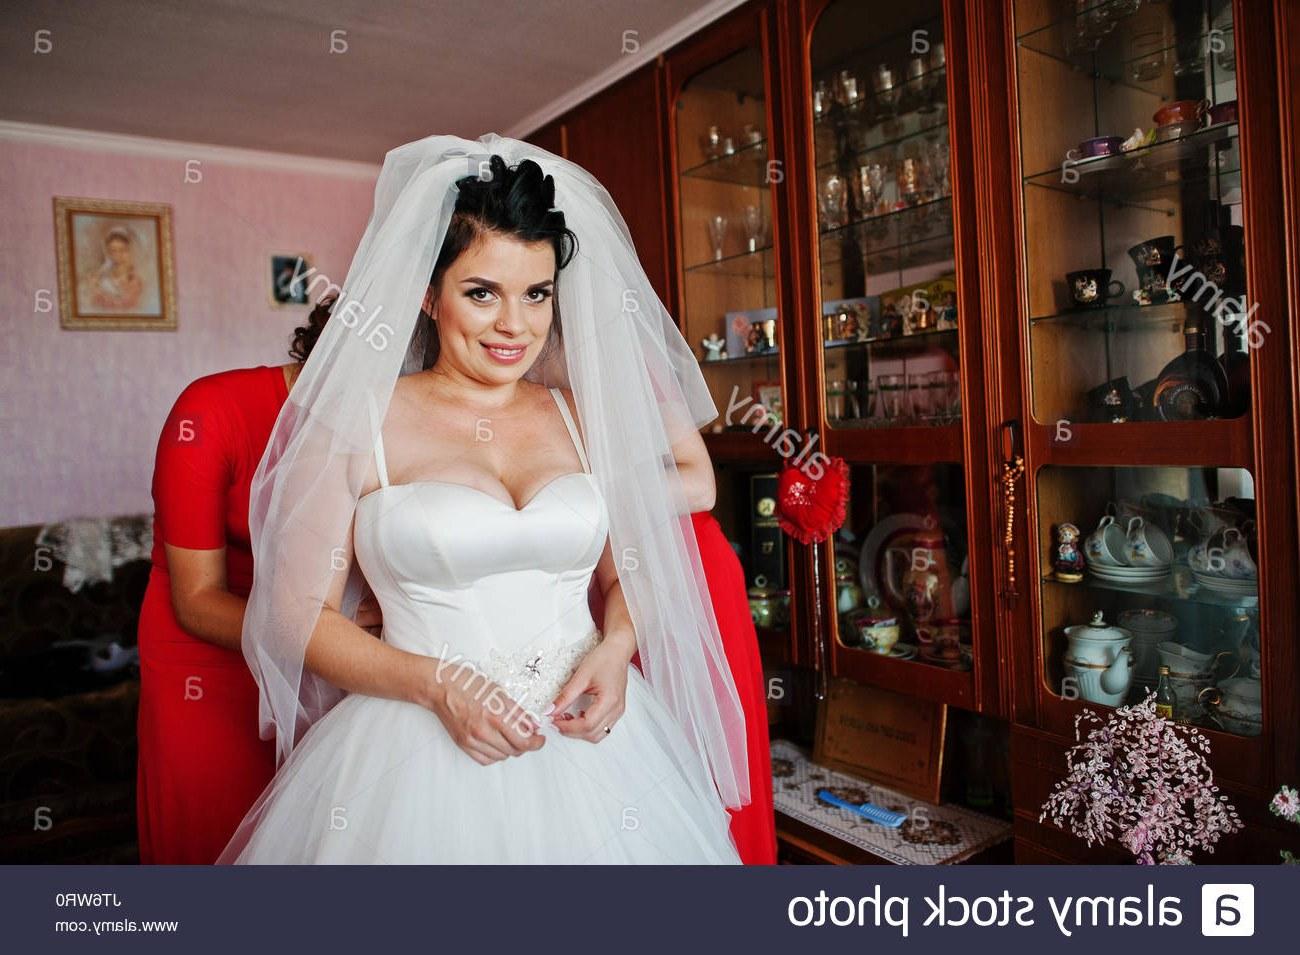 Ide Long Dress Bridesmaid Hijab H9d9 Helpful Bridesmaids Helping Bride to Dress Up and Ready